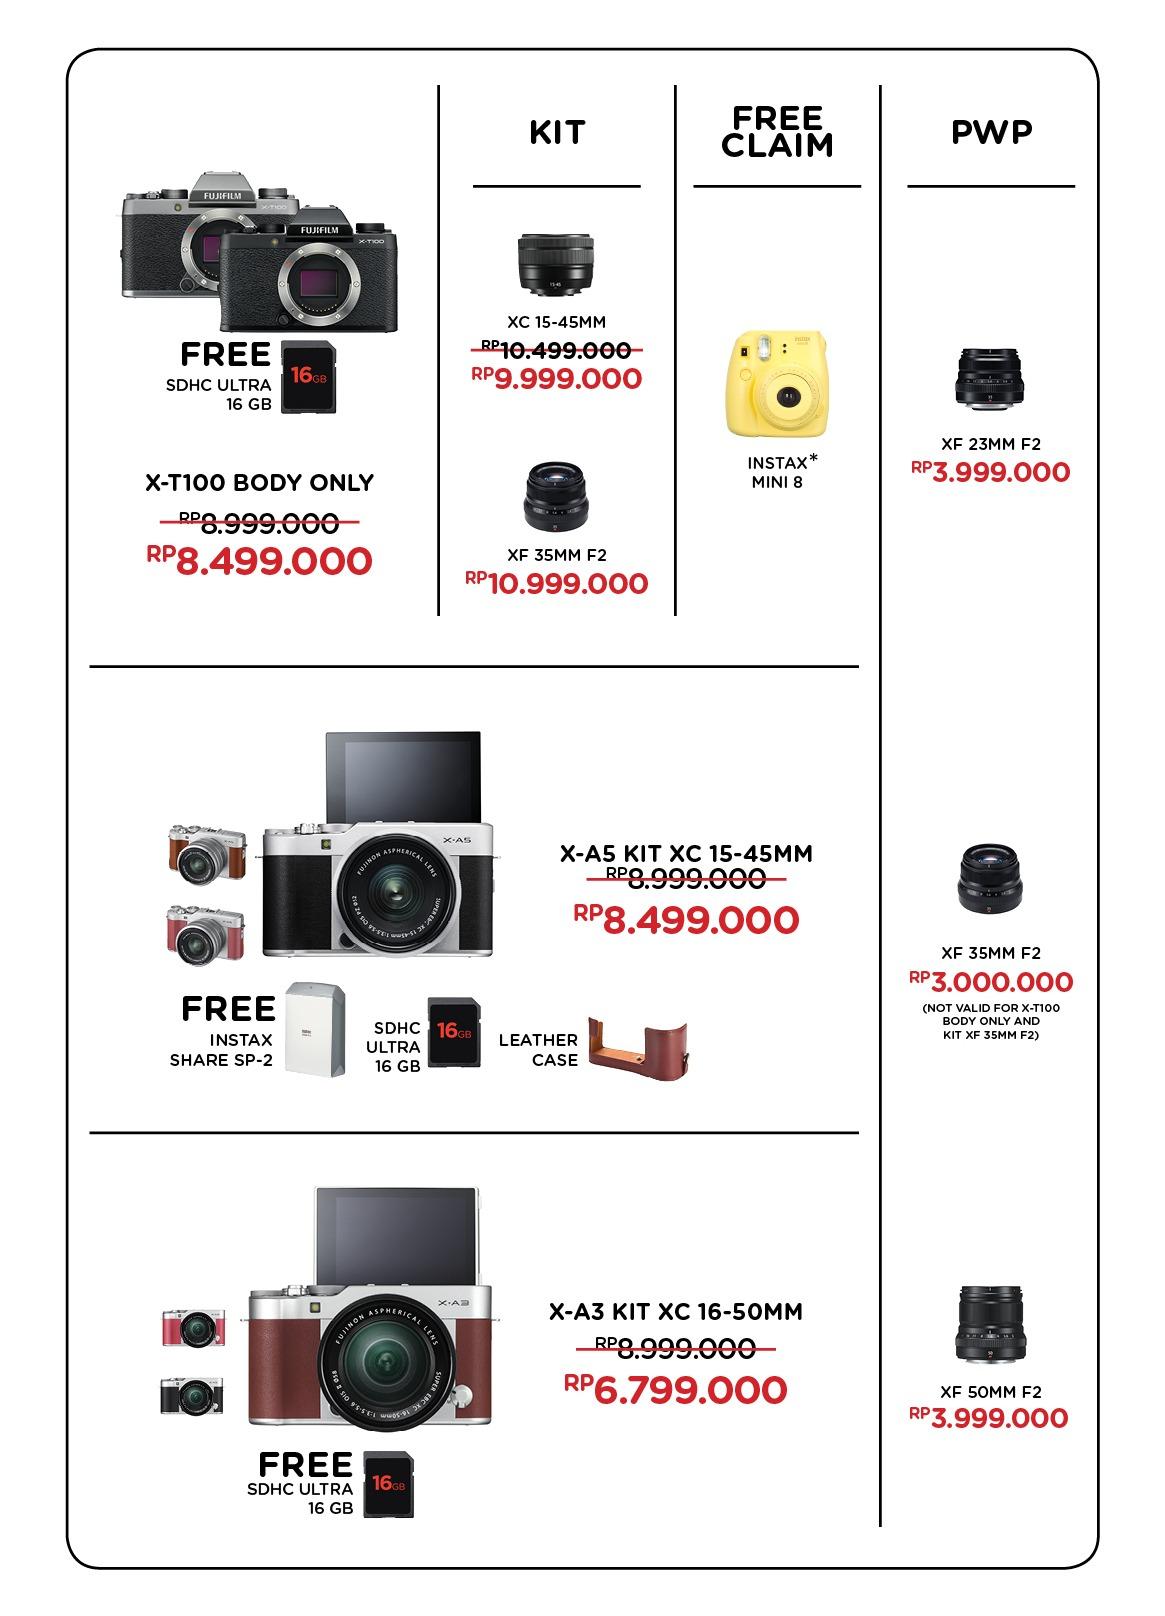 Jpc Kemang Sony Alpha A5100 Kit 16 50mm Hitam Fujifilm Xa3 Xc Free Sdhc Ultra 16gb Jpckemang Garansi Resmi